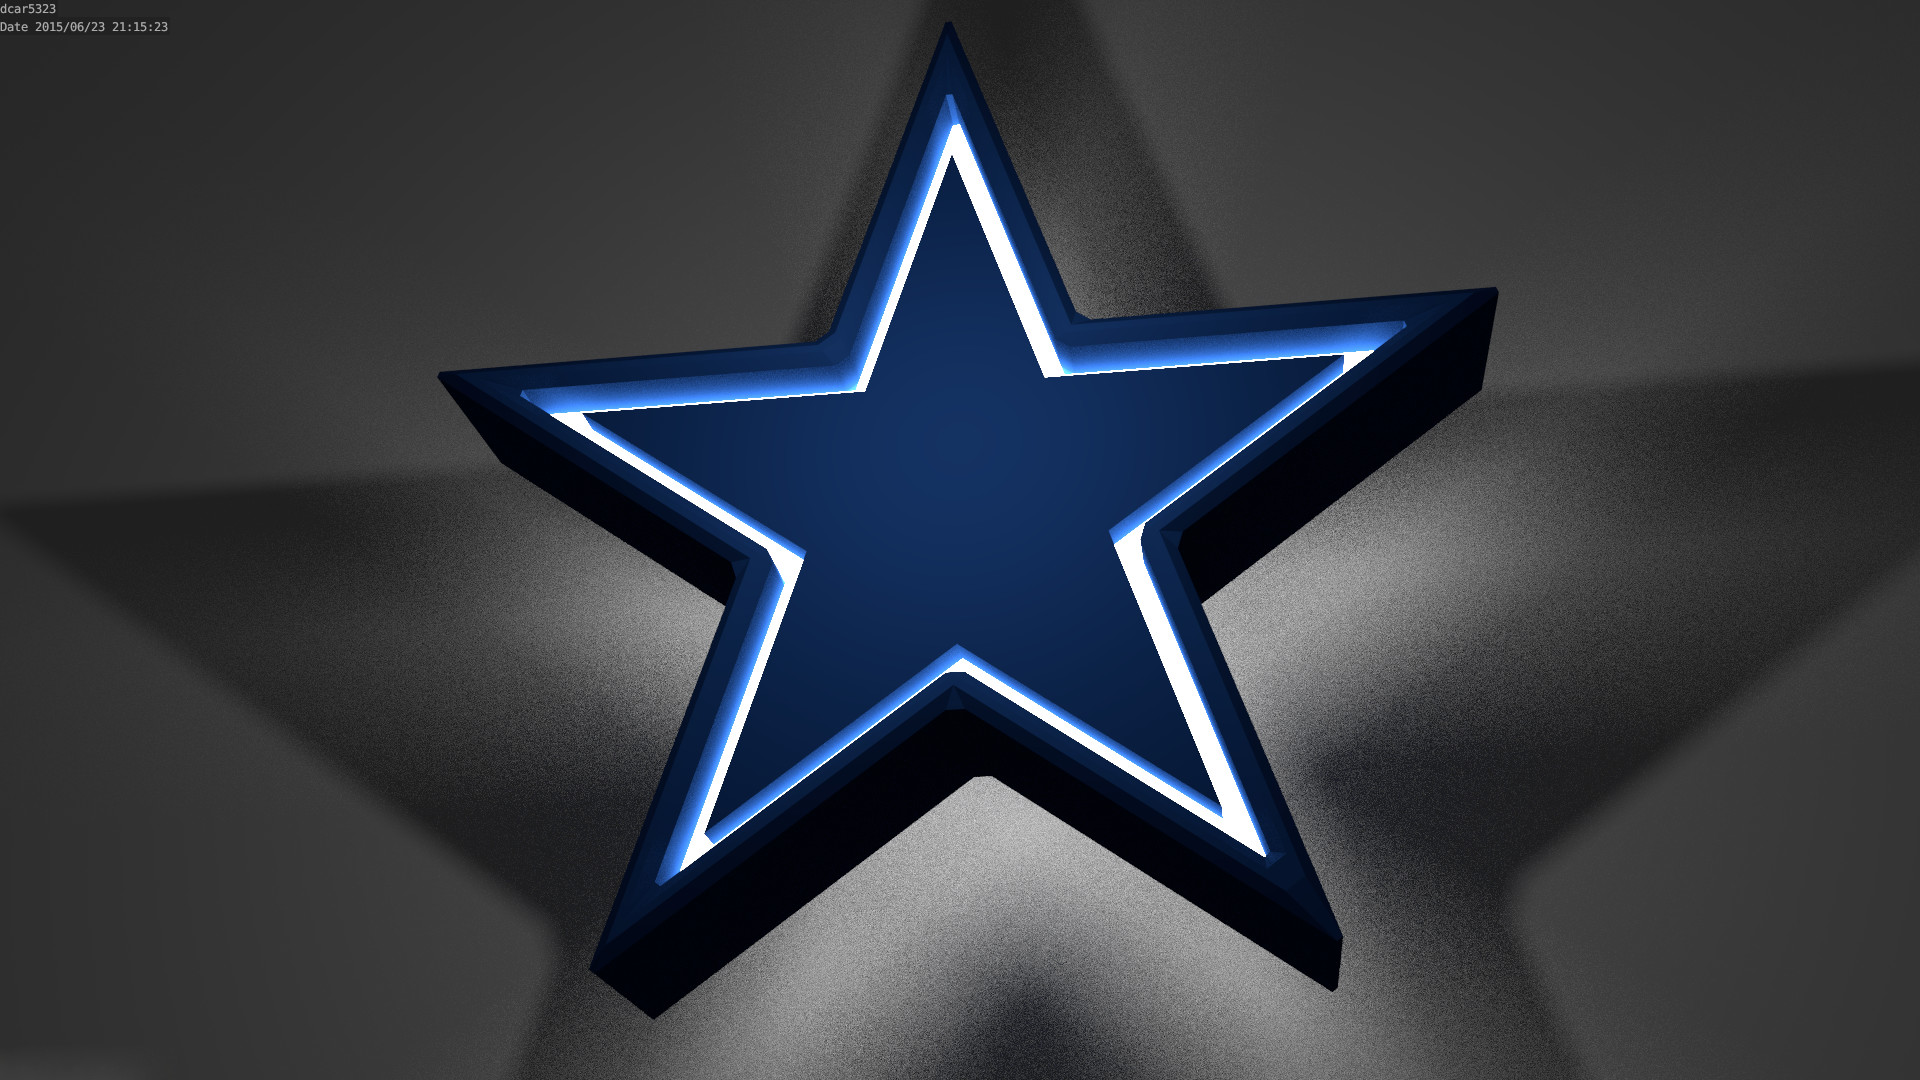 Dallas Cowboy Wallpaper Hd For Desktop   Data Src Dallas - Dallas Cowboys - HD Wallpaper